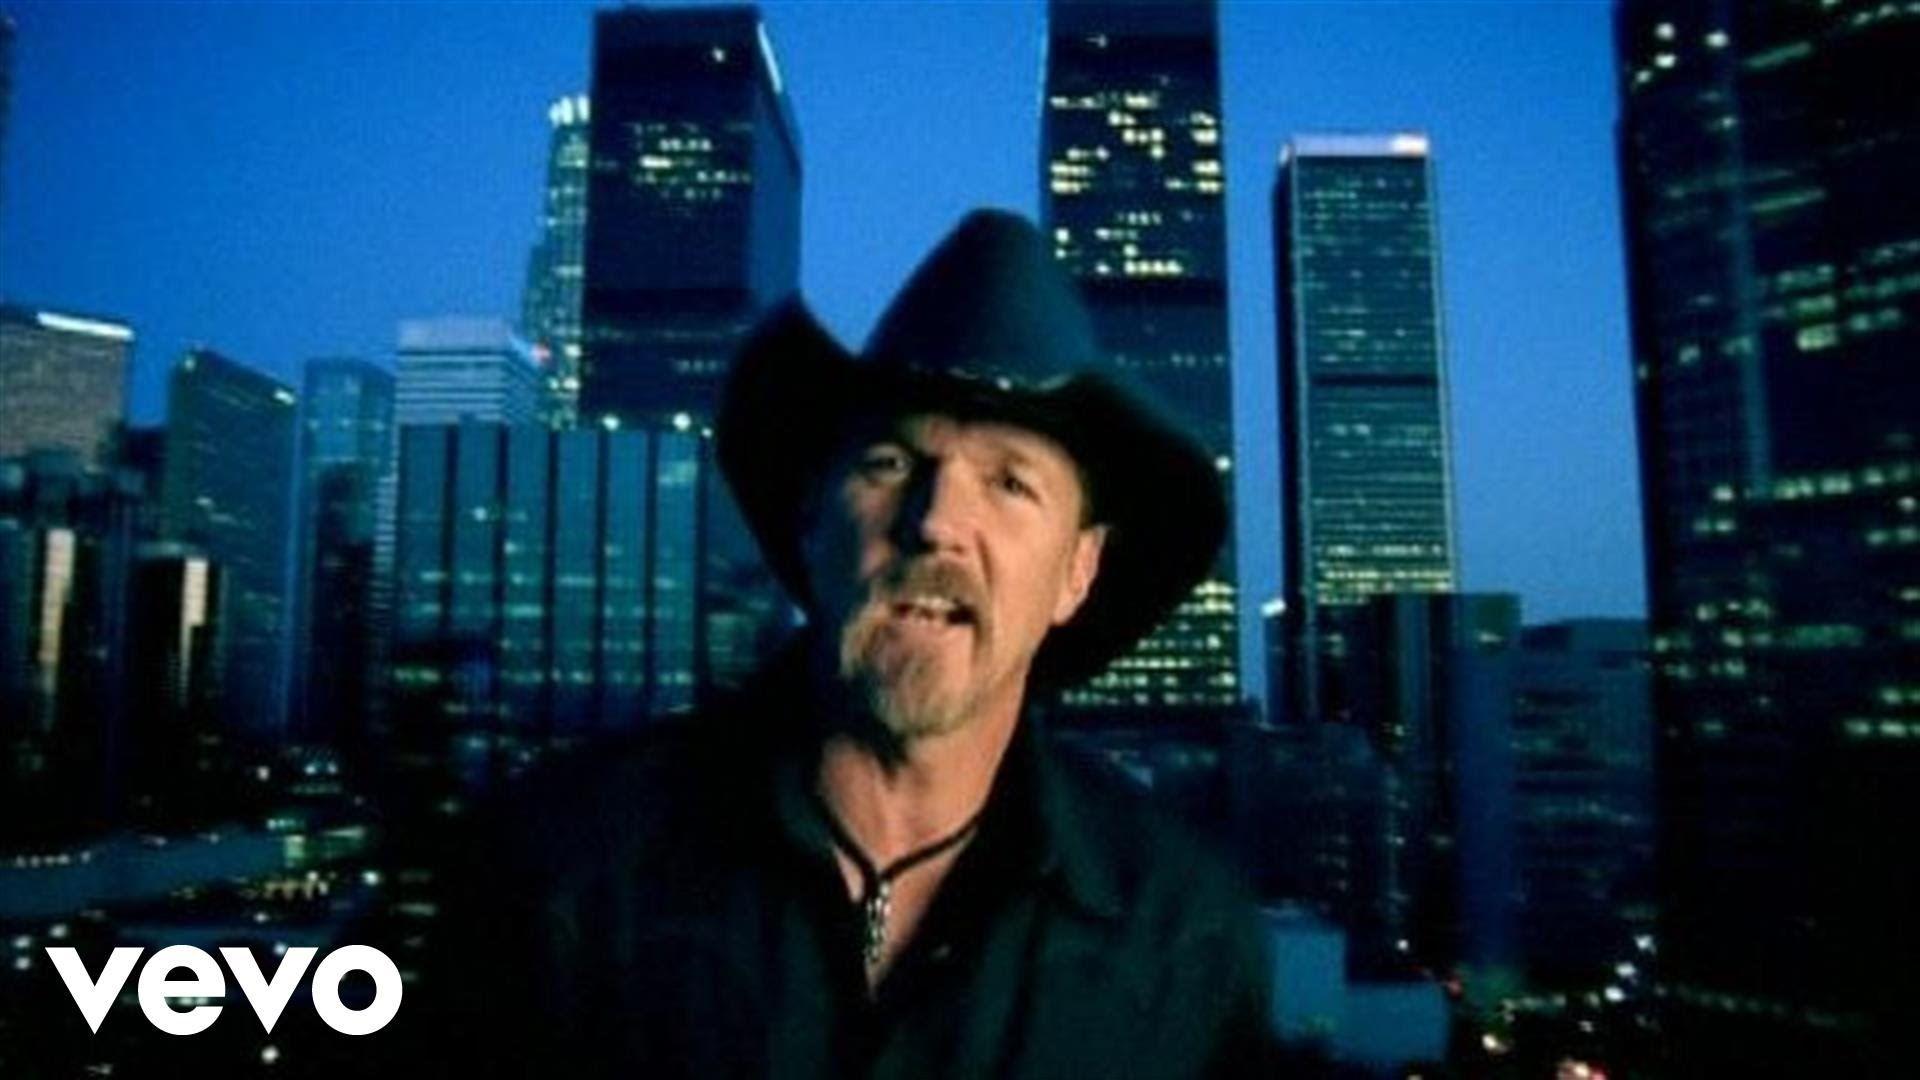 Trace Adkins - Ladies Love Country Boys - https://www.youtube.com/watch?v=CBQ01X-1AlI